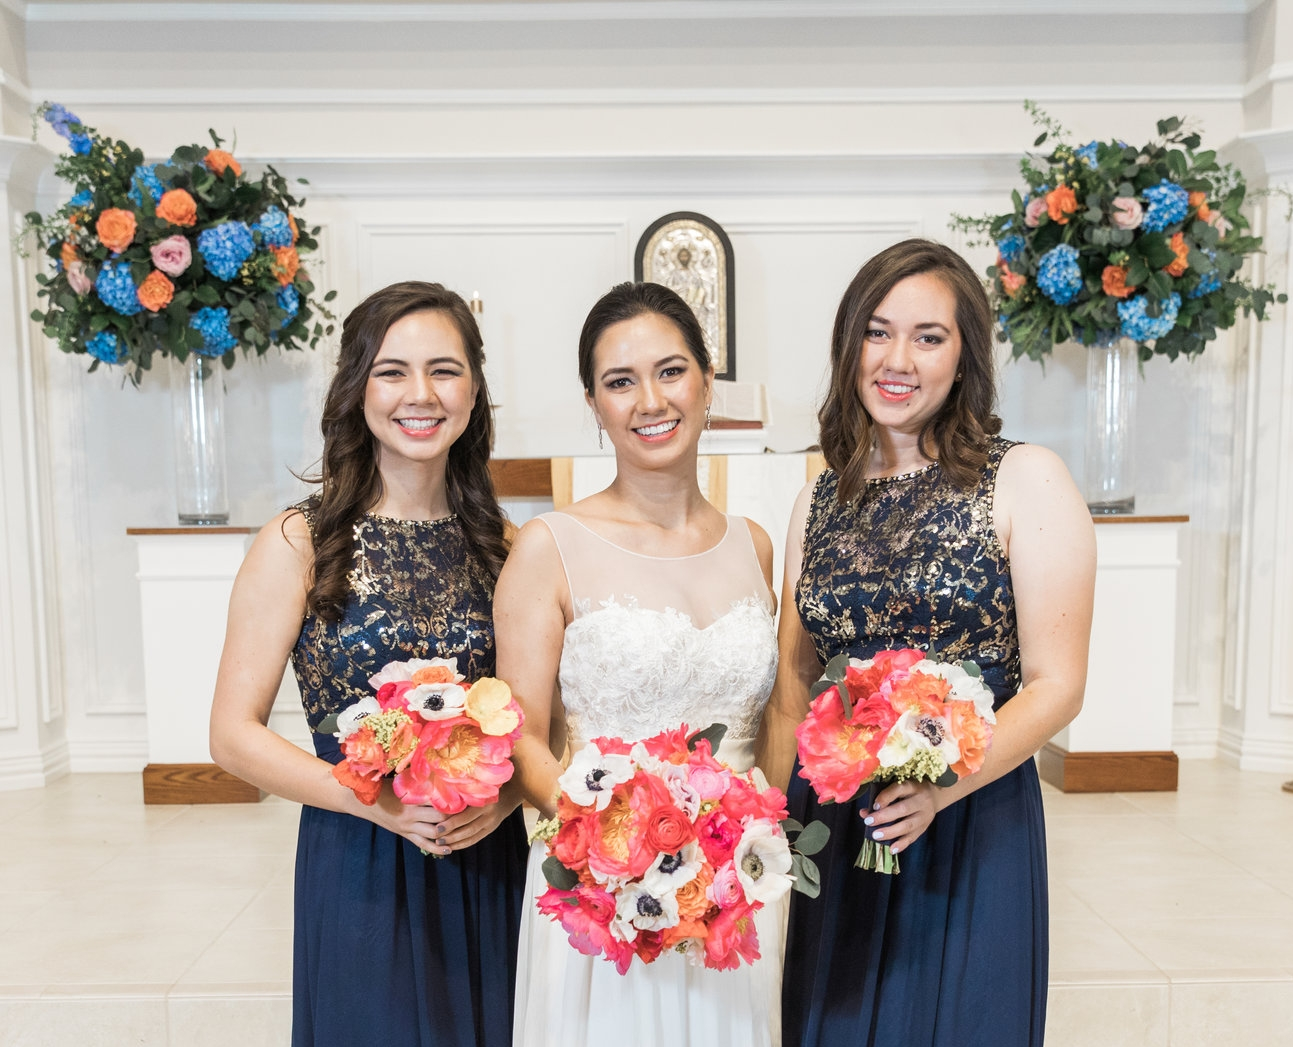 lori_adam_wedding-164.JPG